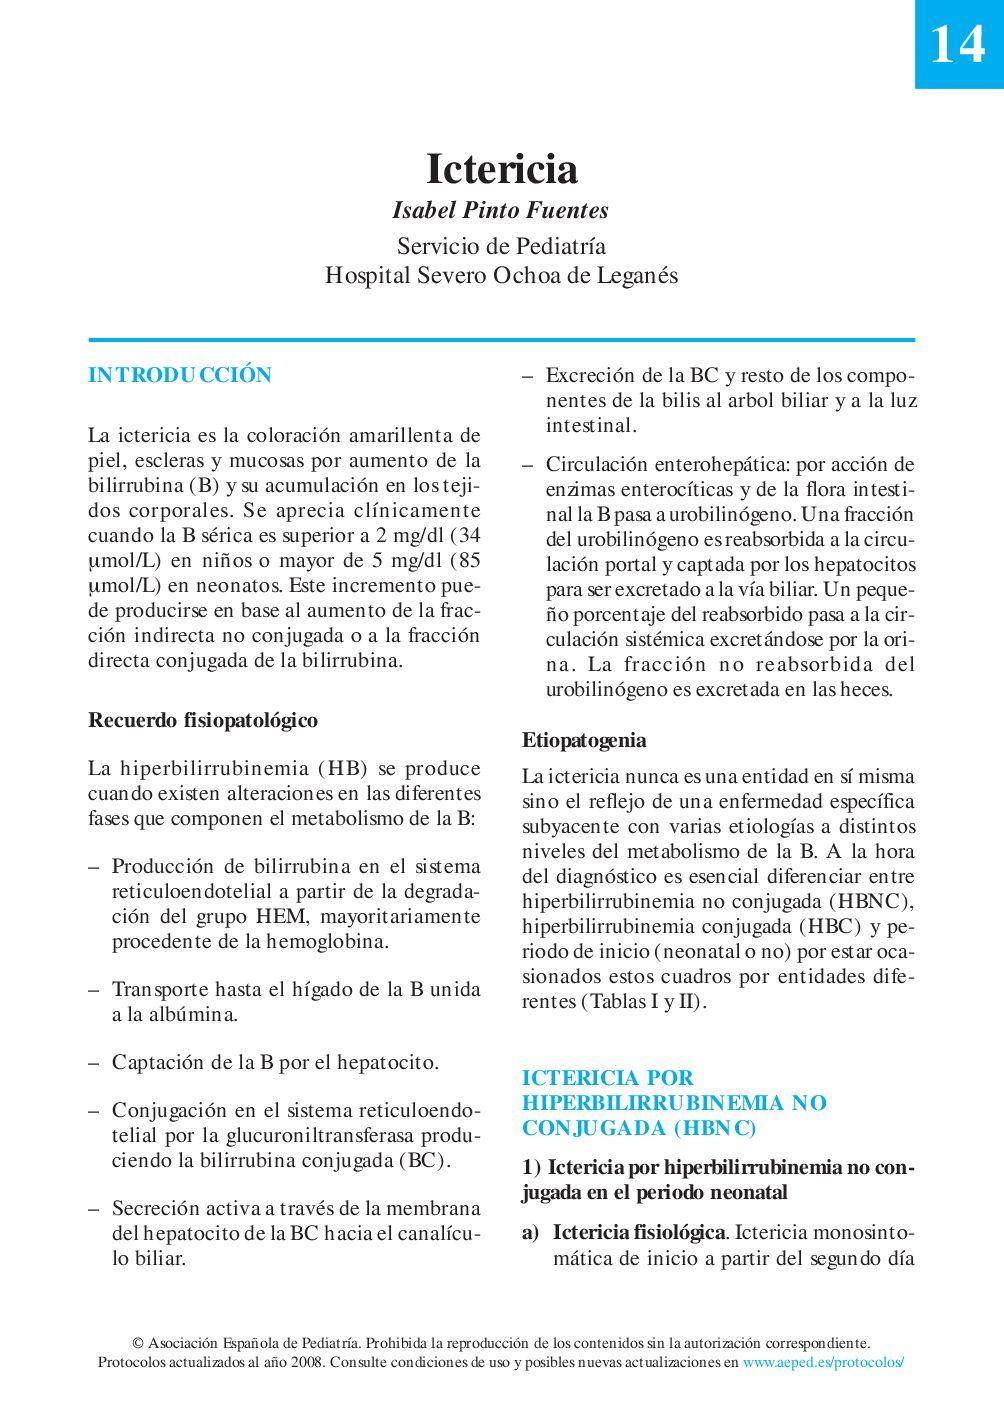 ictericia+por+aumento+de+bilirrubina+conjugada